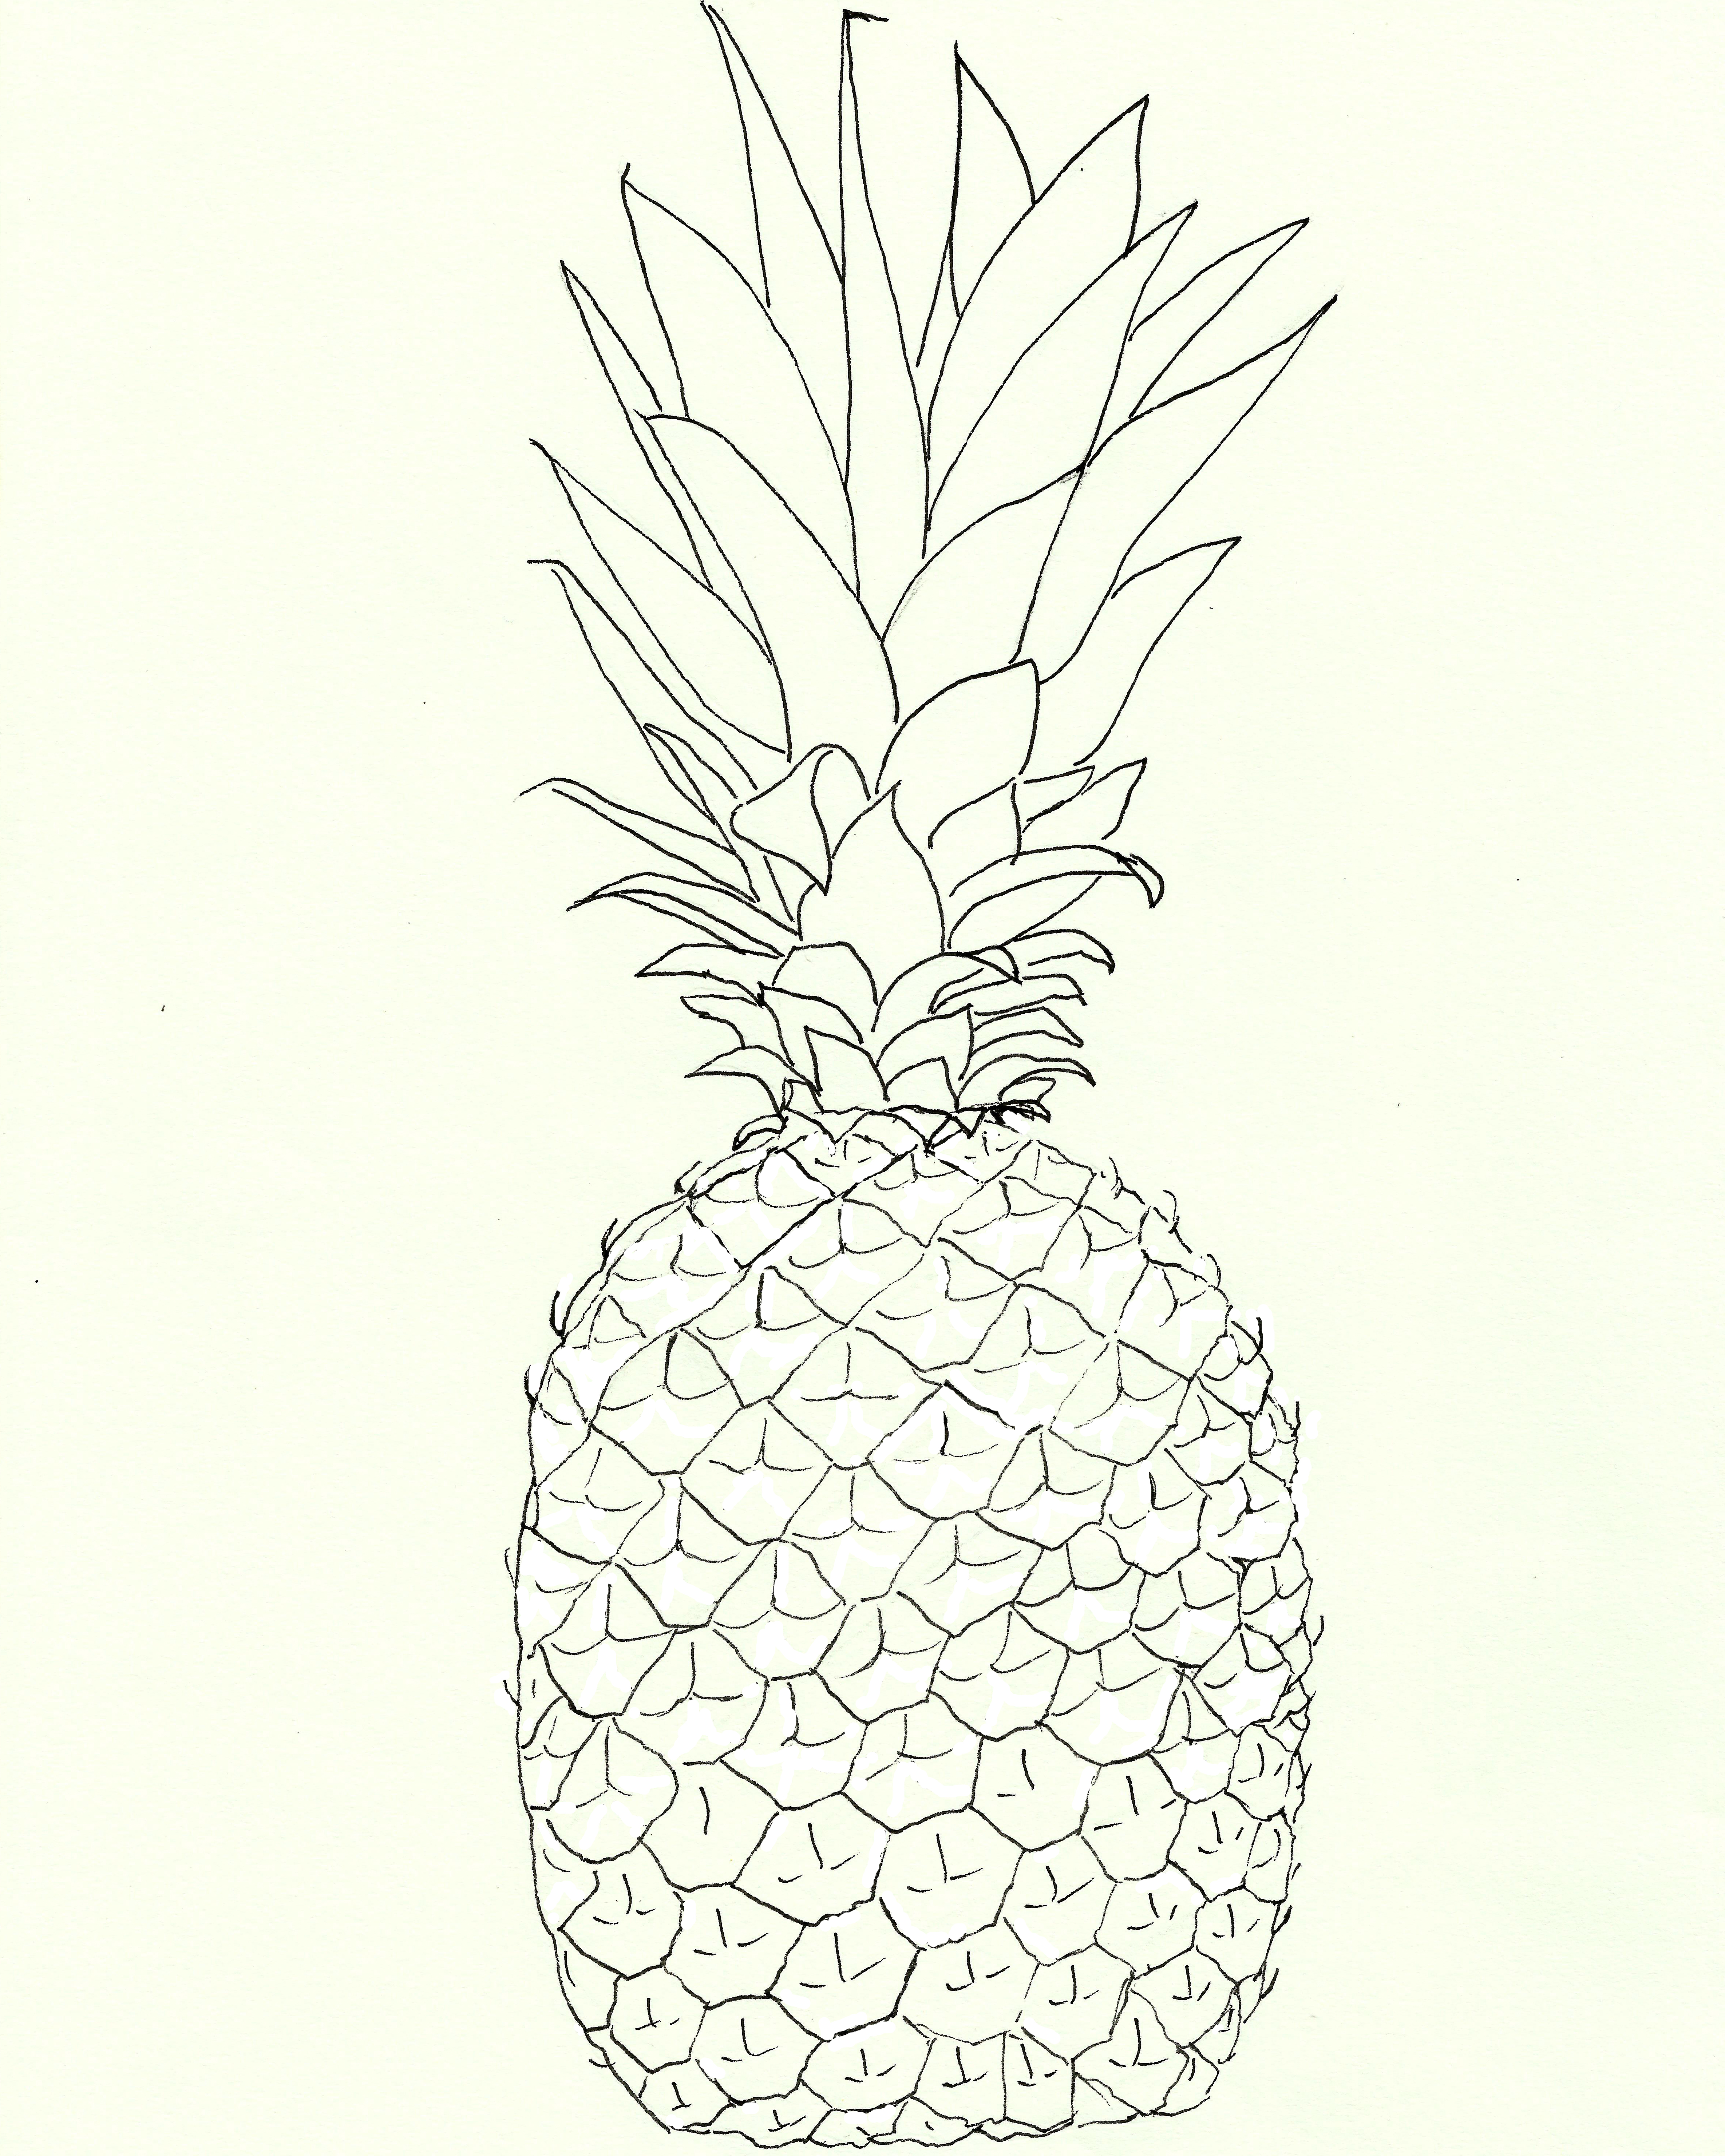 Drawn pineapple #11